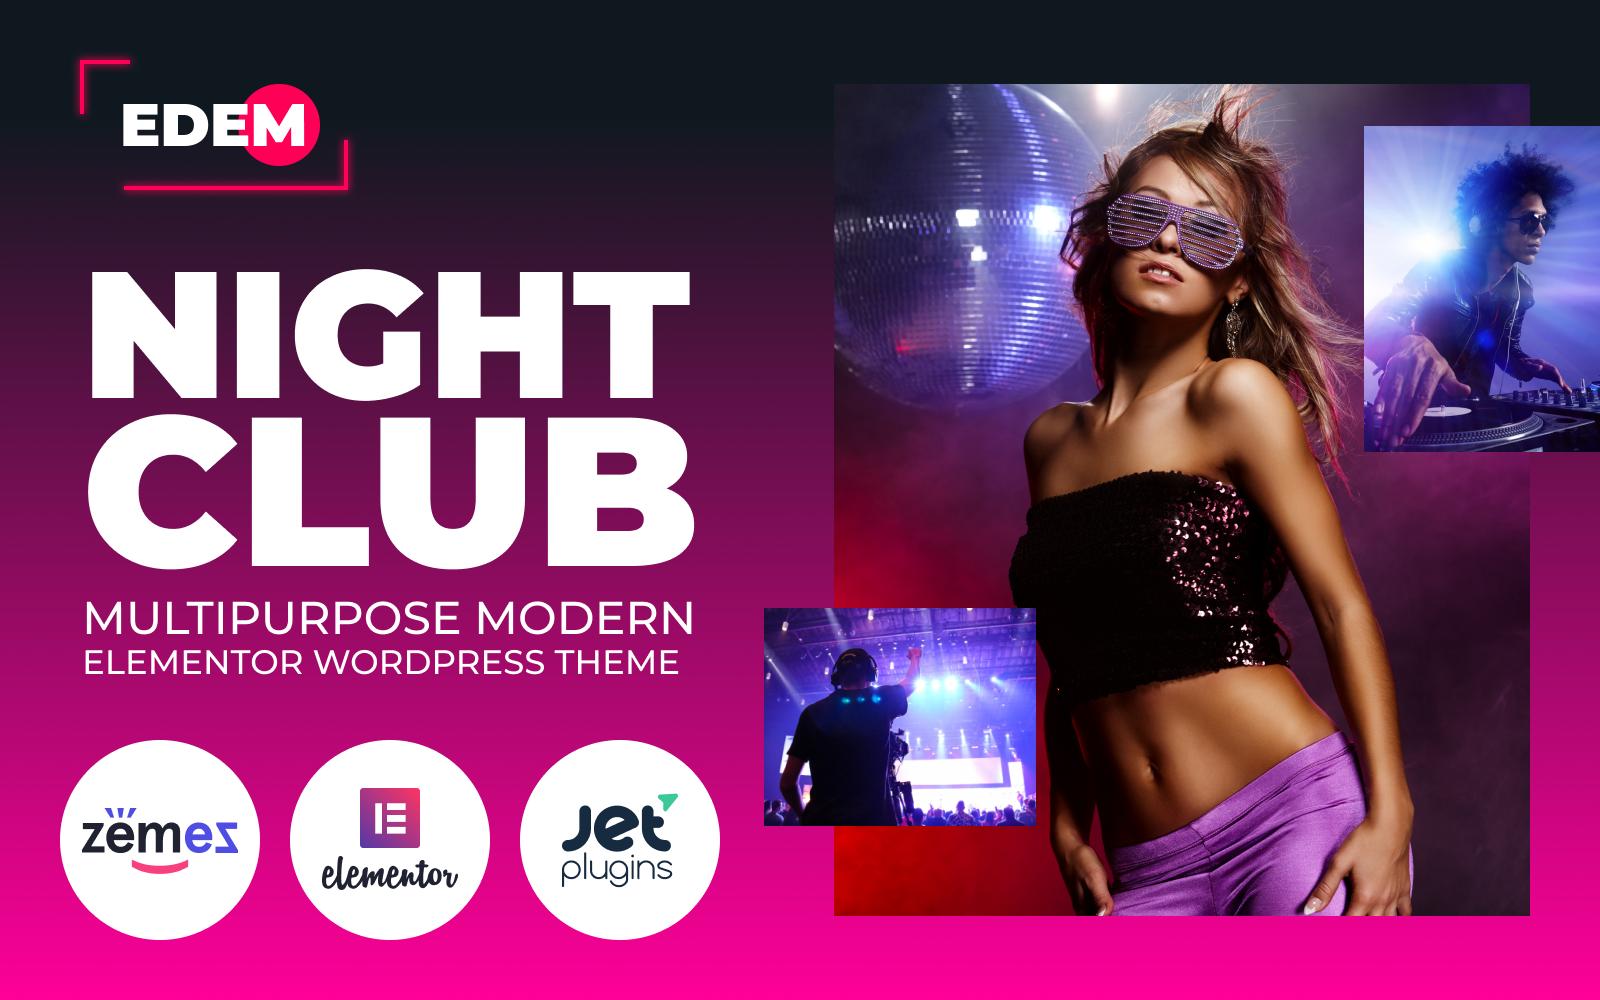 """Edem - Night Club Multipurpose Modern Elementor"" 响应式WordPress模板 #84736"